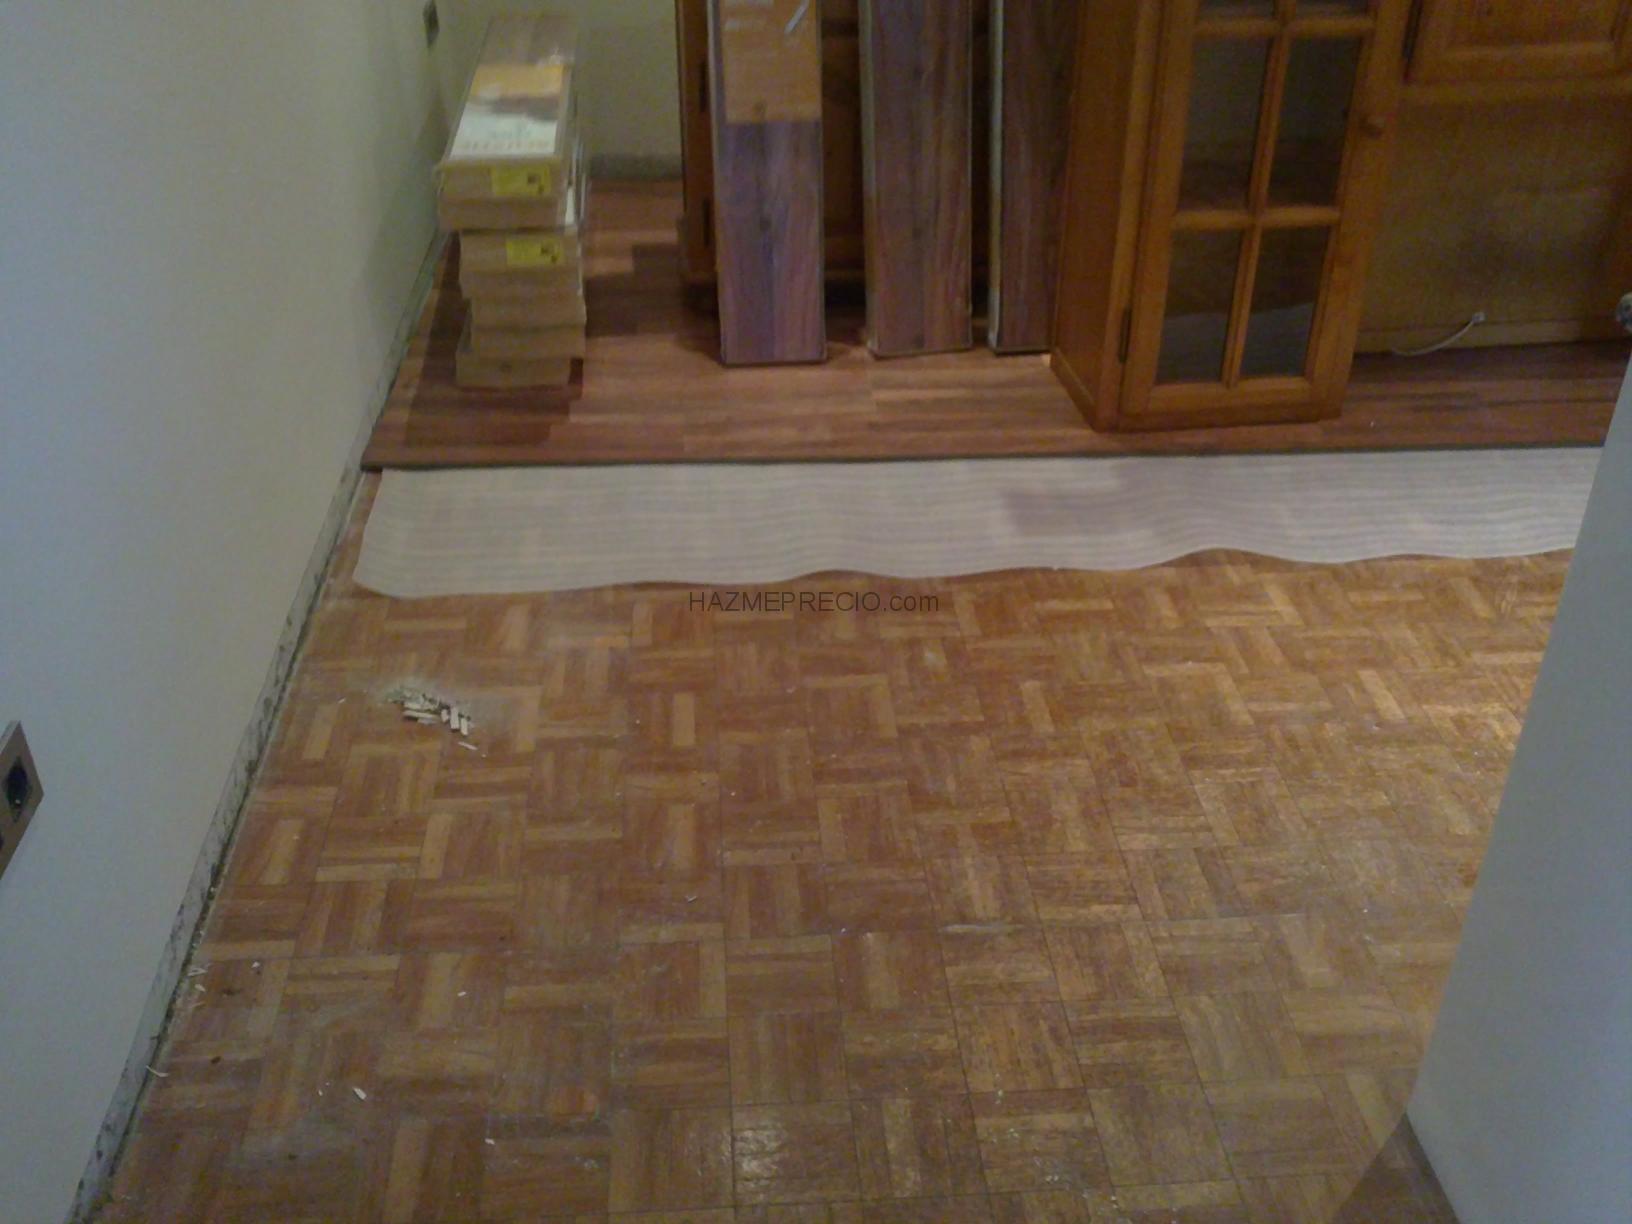 Rehabilitacion de viviendas asturias - Tarima para cocina ...